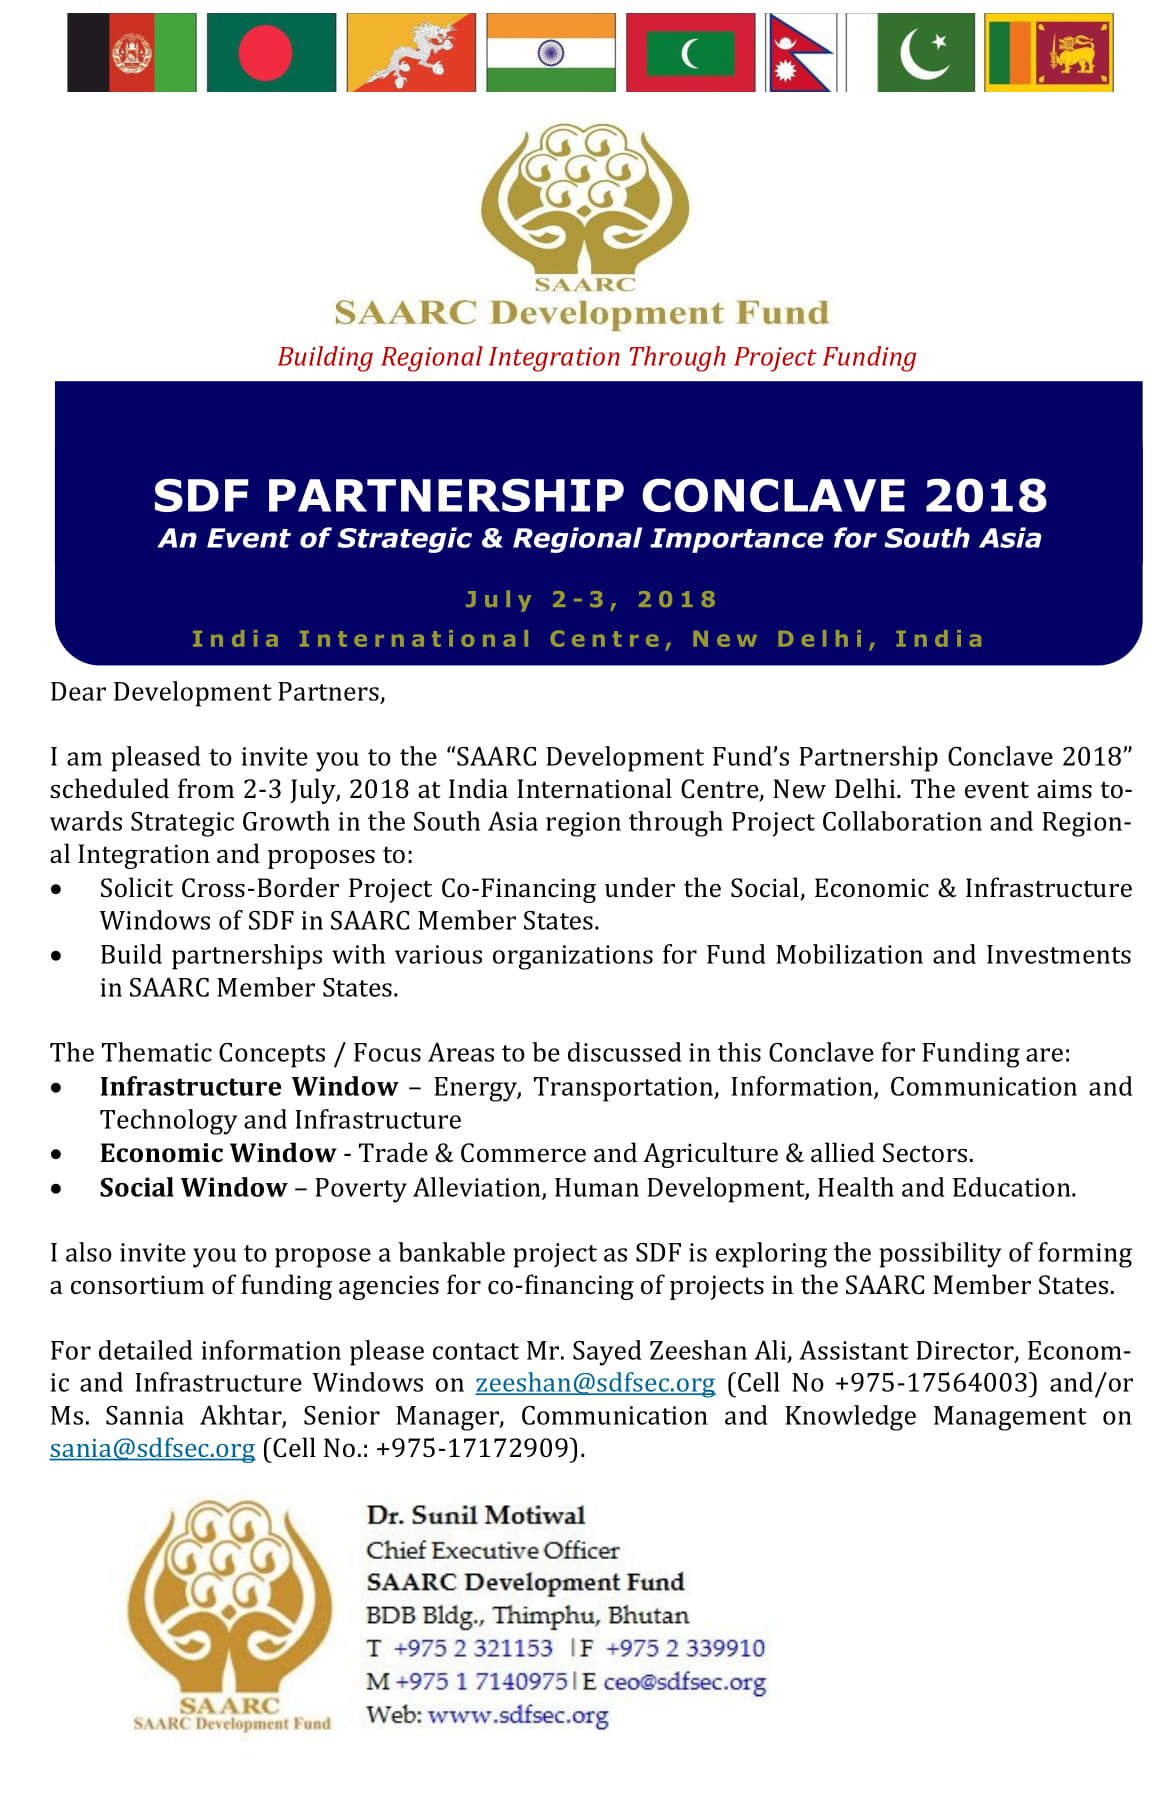 SAARC Development Fund Secretariat for regional integration